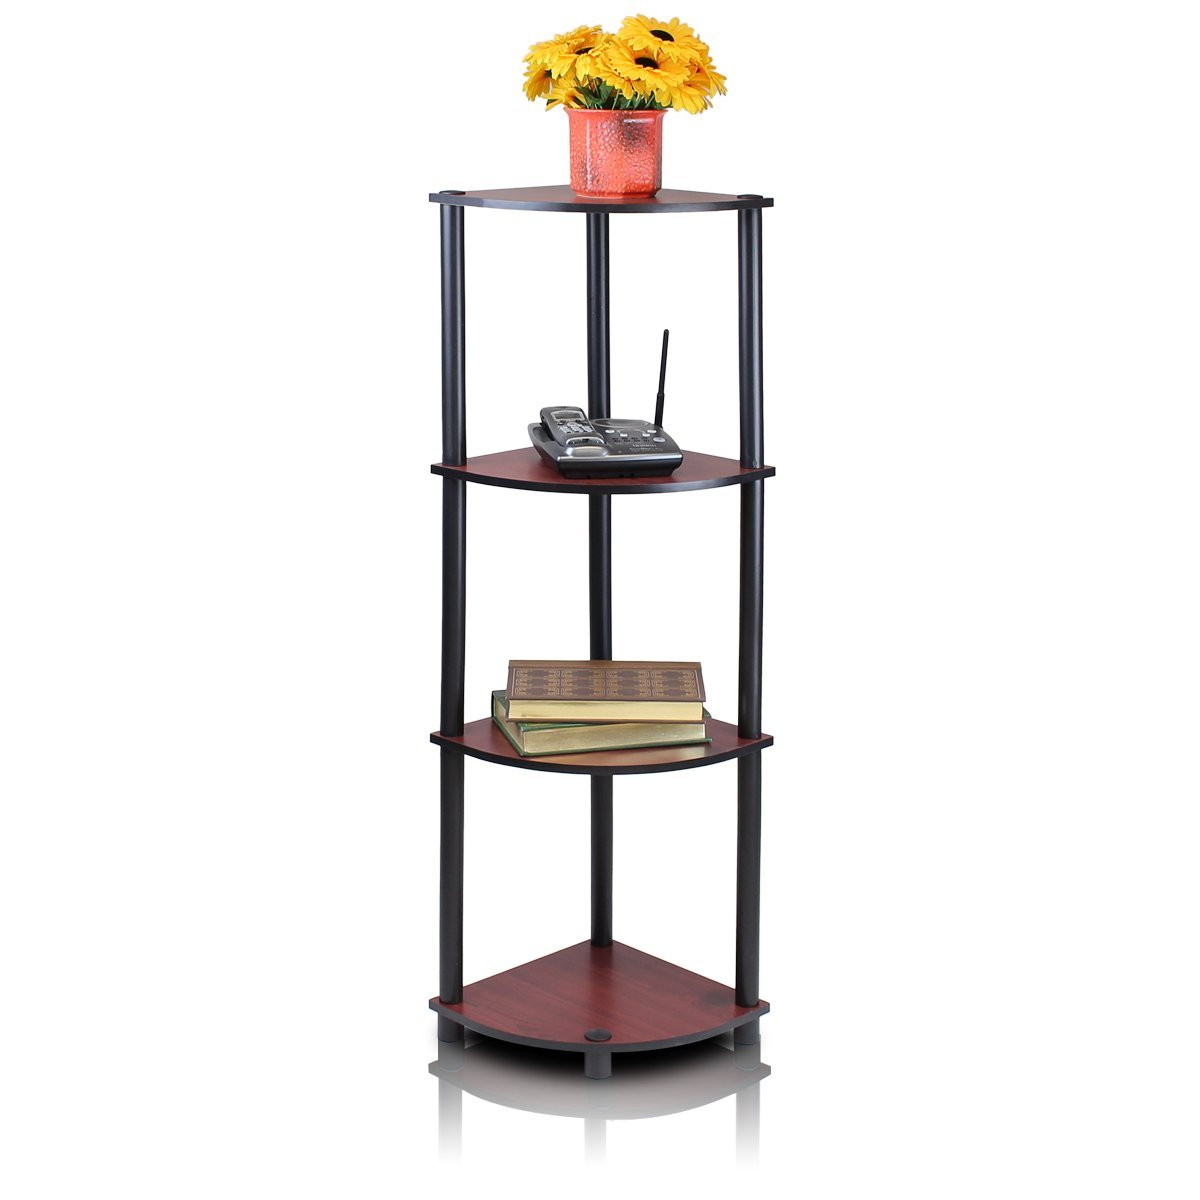 Tiered Display Shelves ~ Tier corner shelving unit and display rack dark cherry